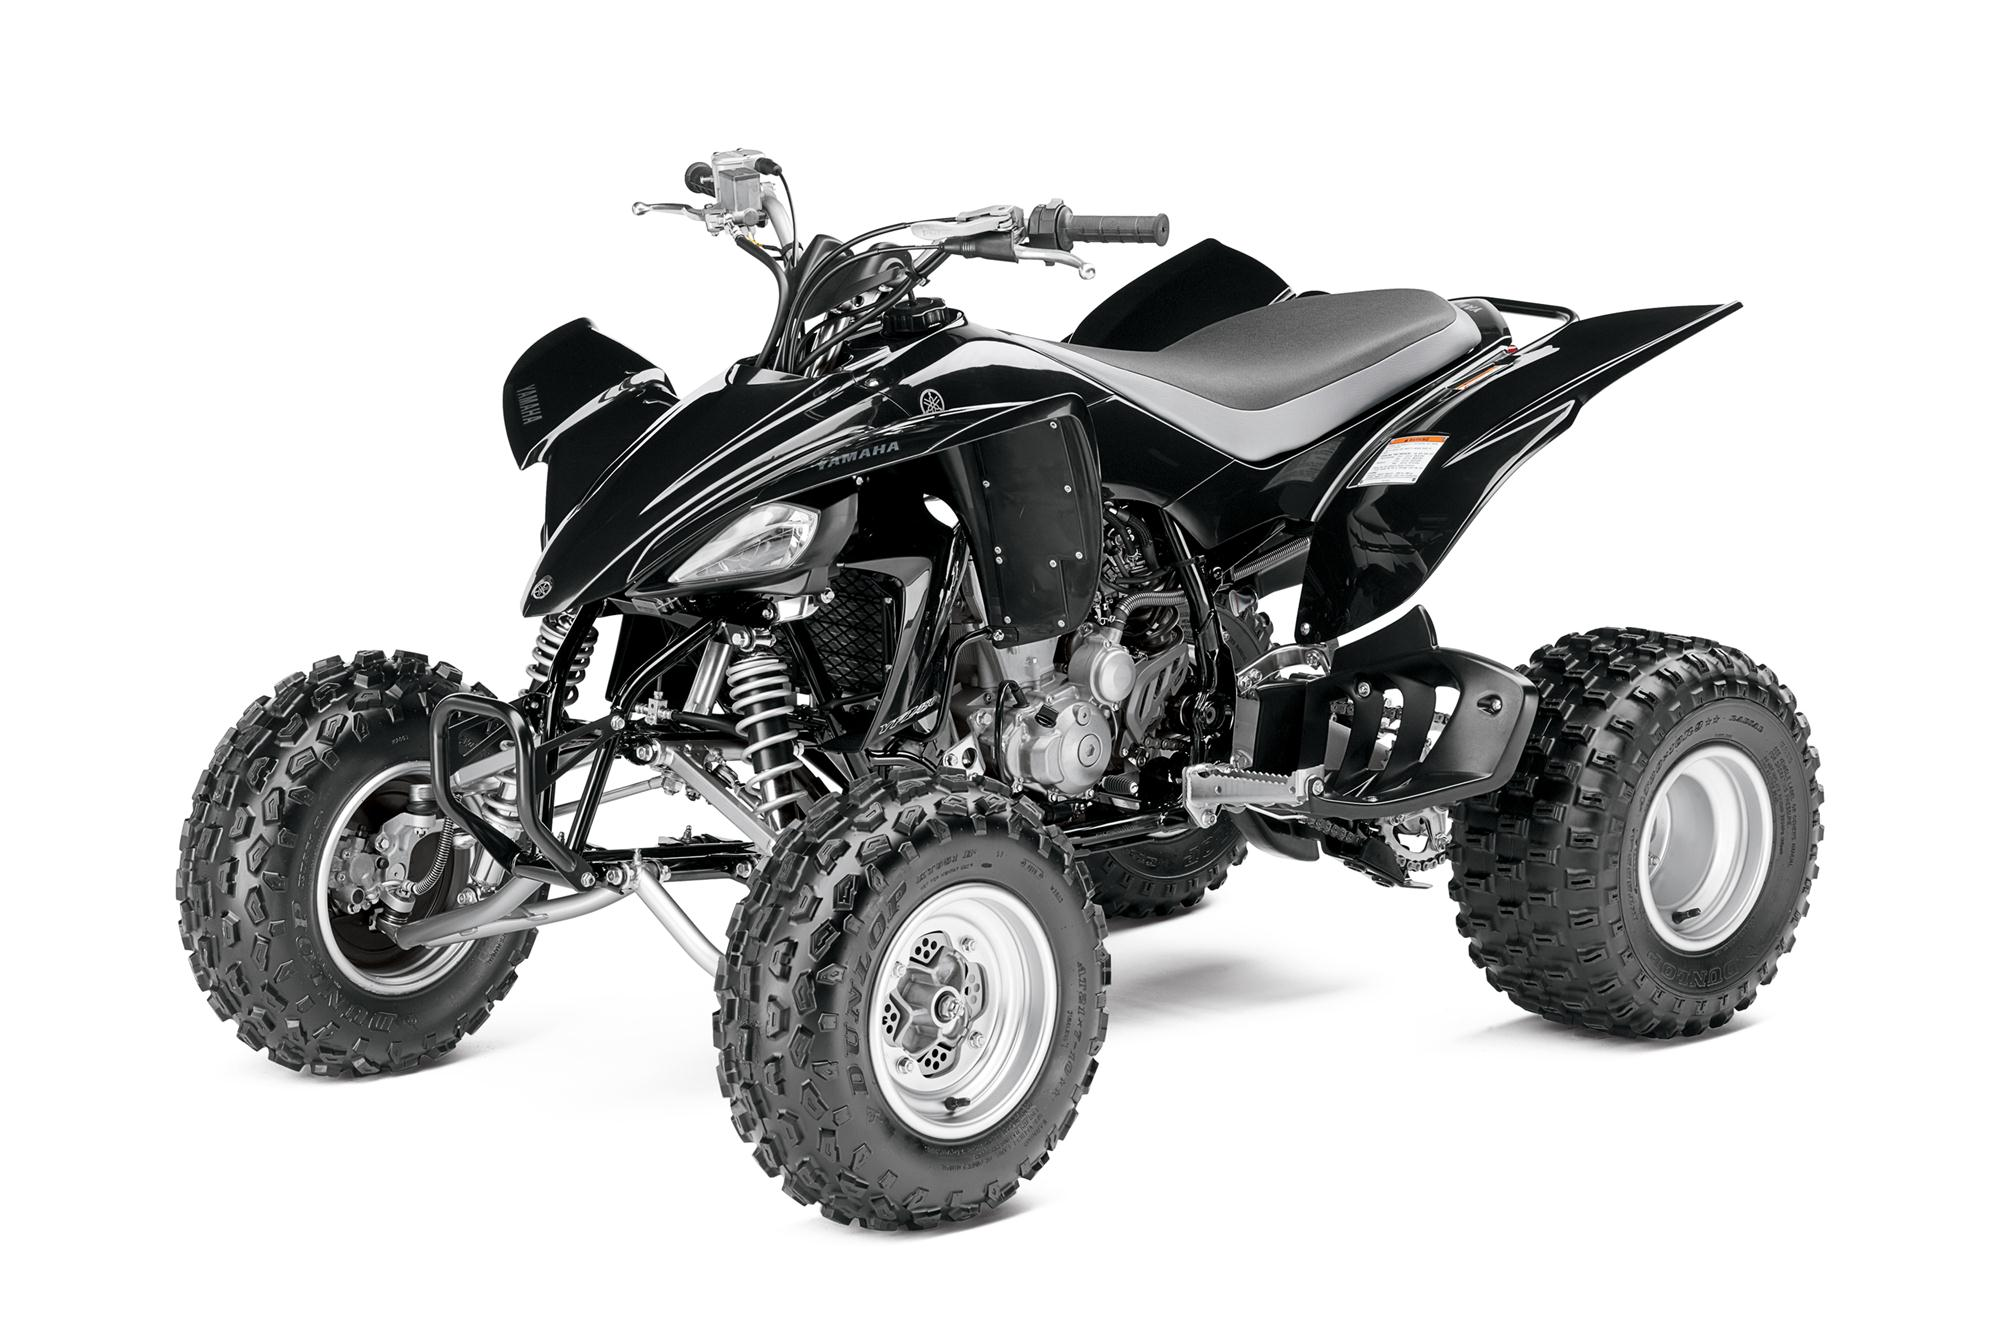 2013 yfz 450 reviews autos post for Yamaha atv yfz450